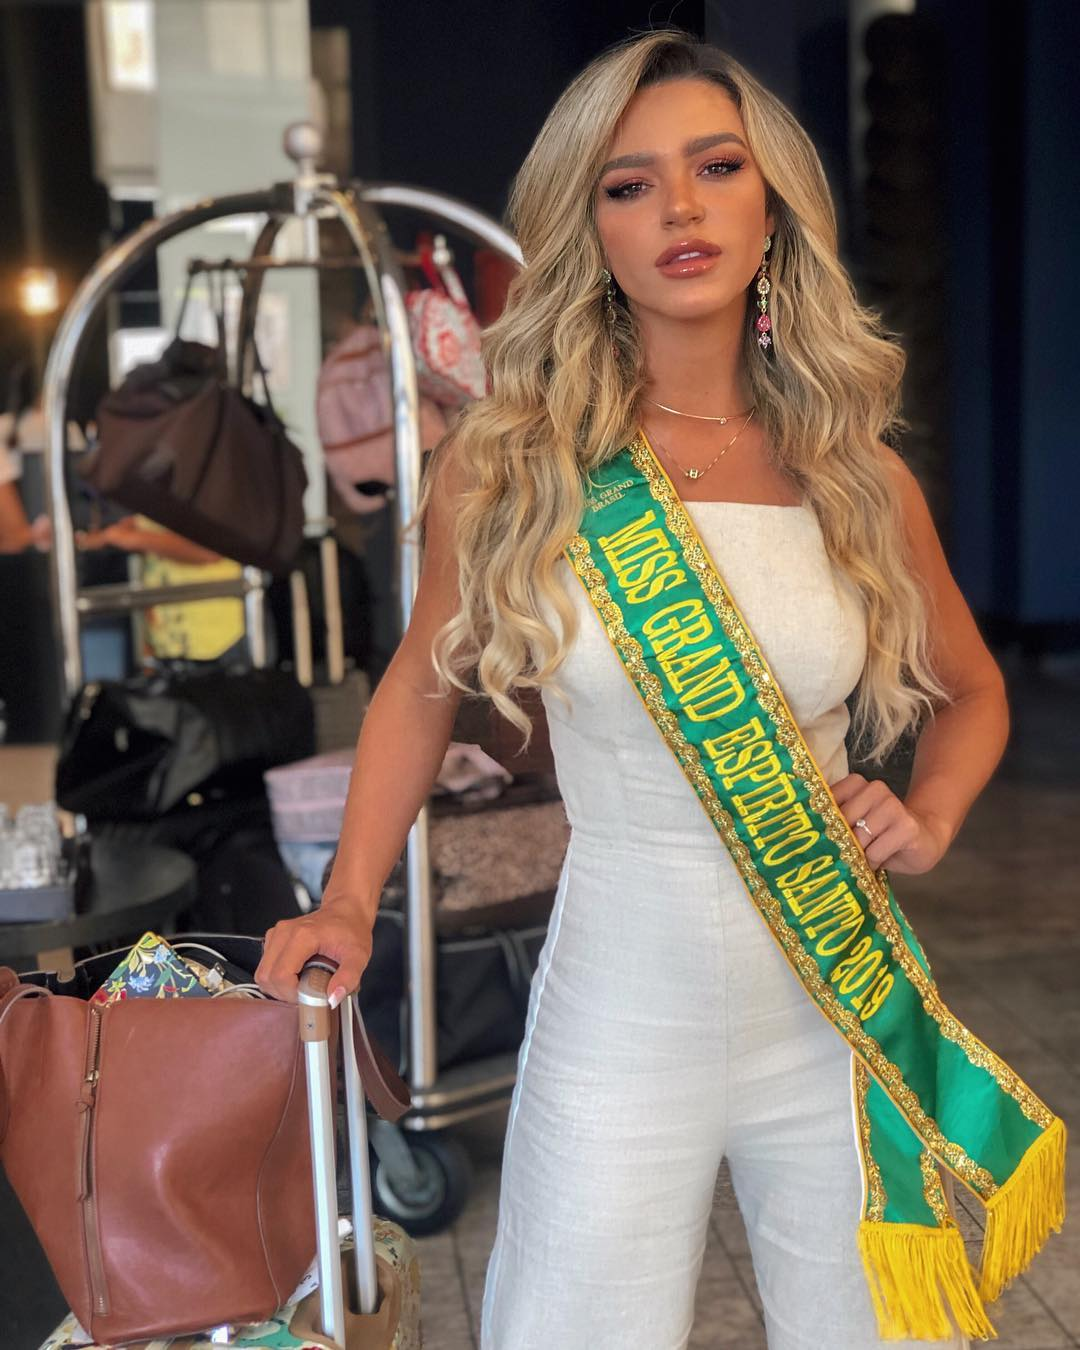 amanda cardoso, miss grand espirito santo 2019/3rd runner-up de miss intercontinental 2017. - Página 13 51428610